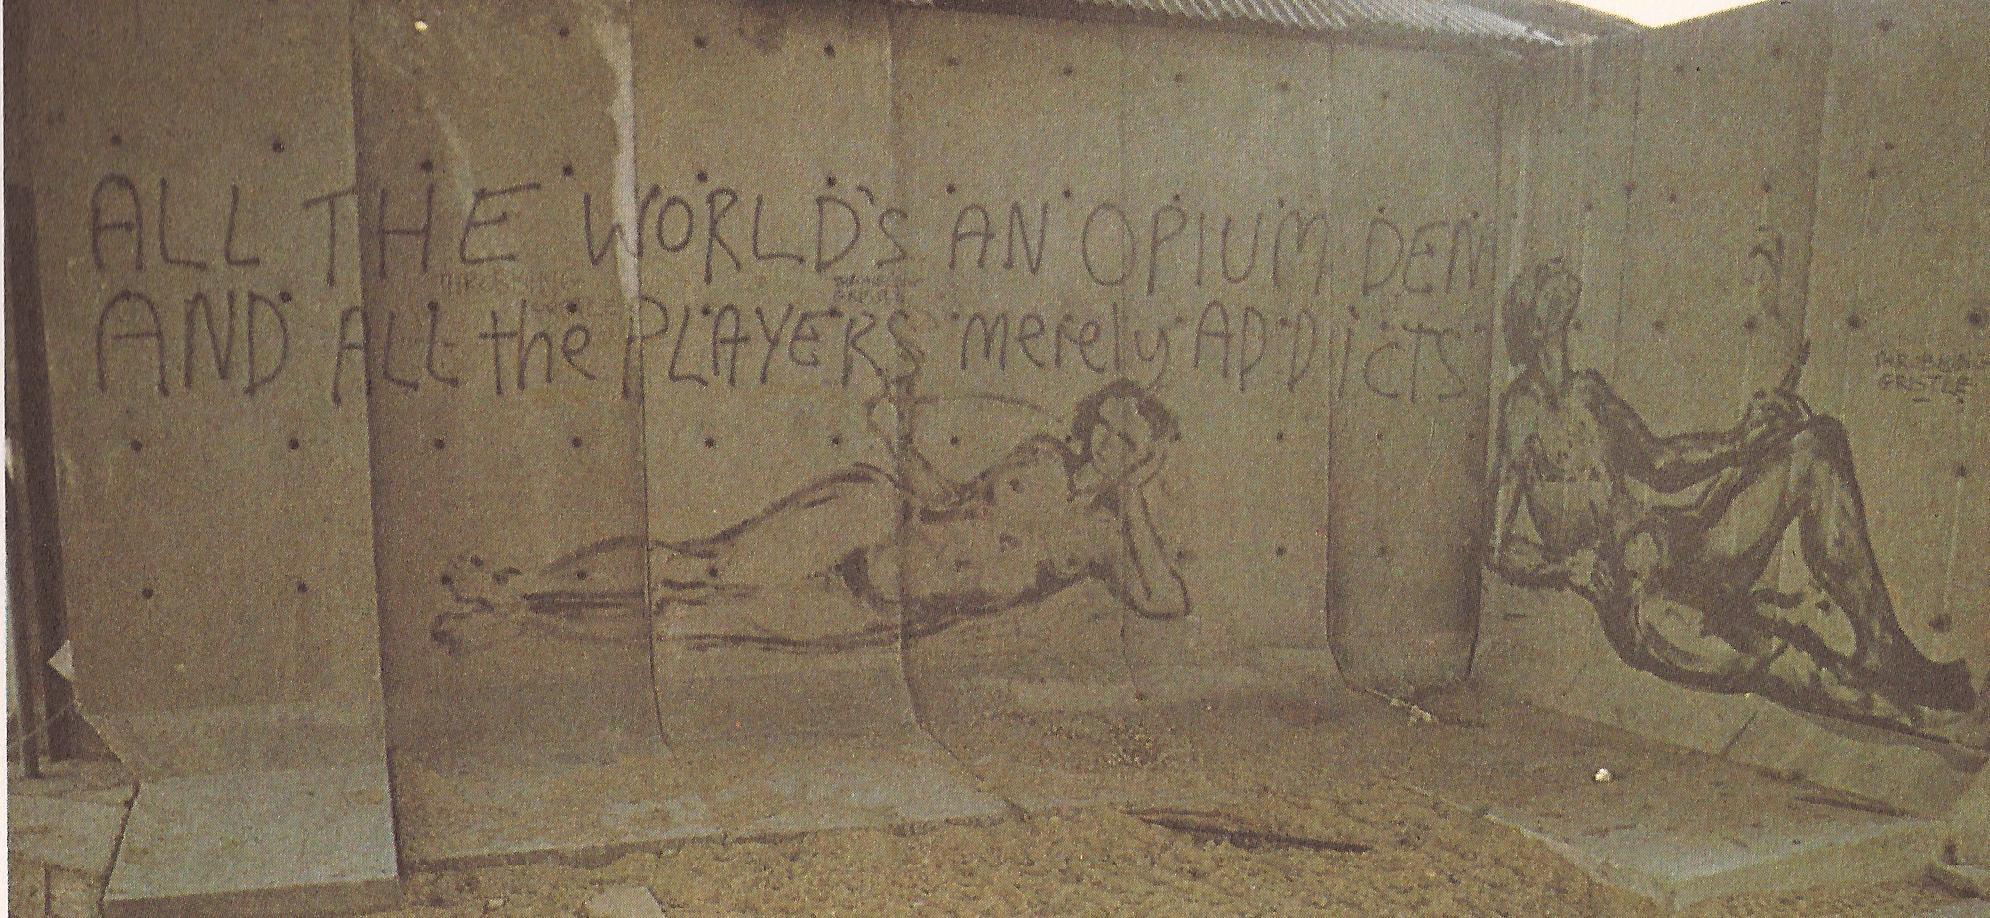 graffiti opium den